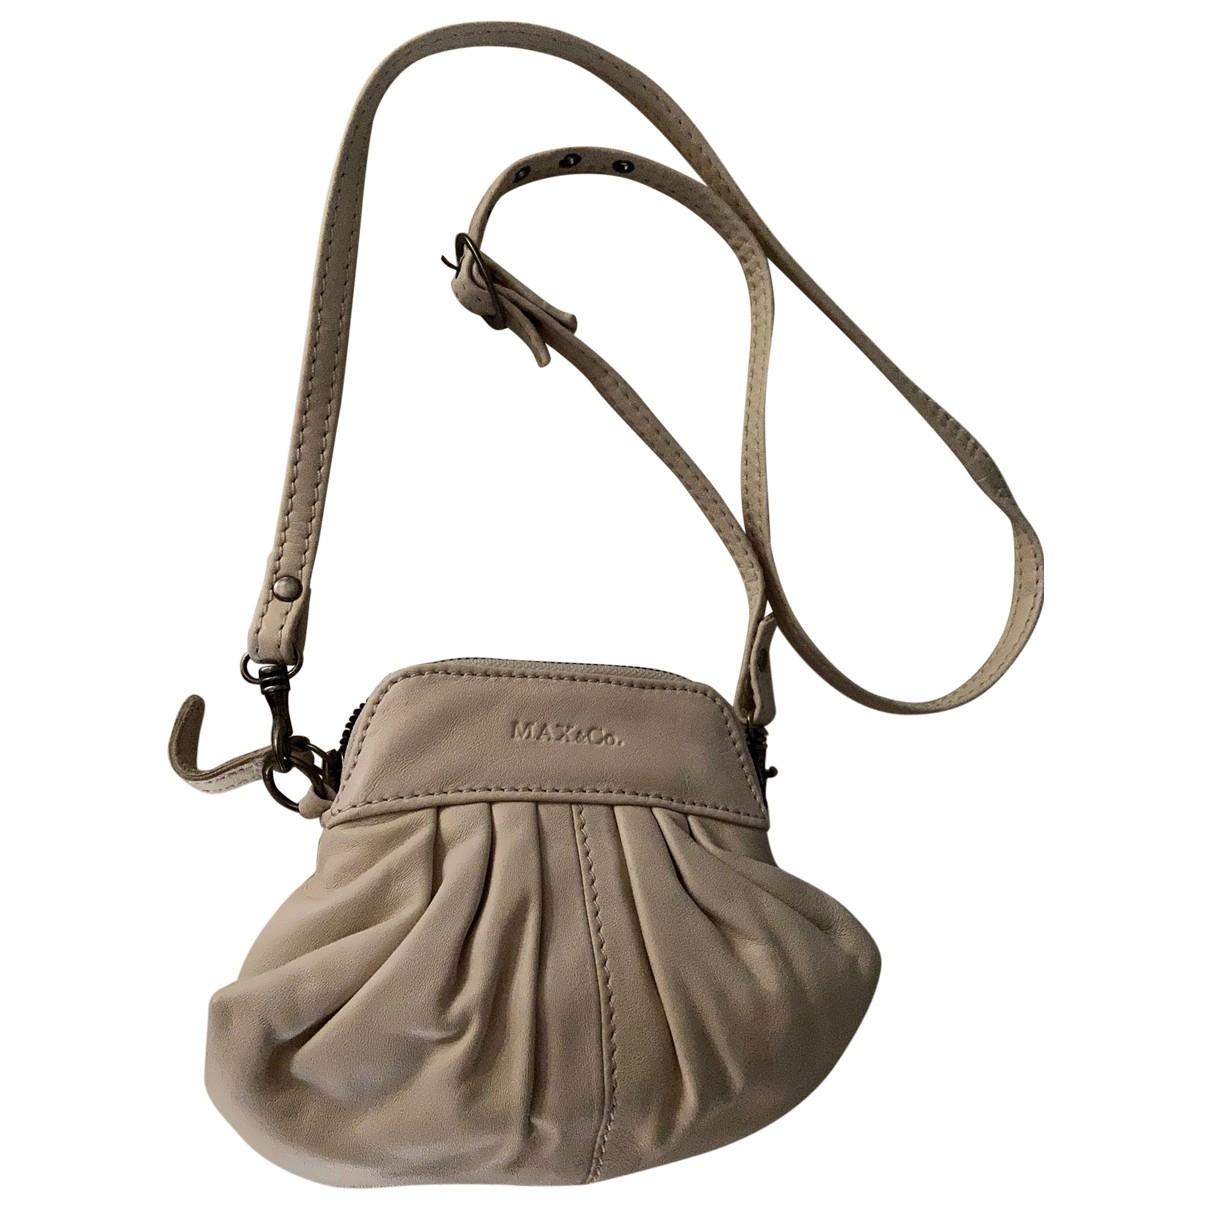 Max & Co \N Beige Leather handbag for Women \N